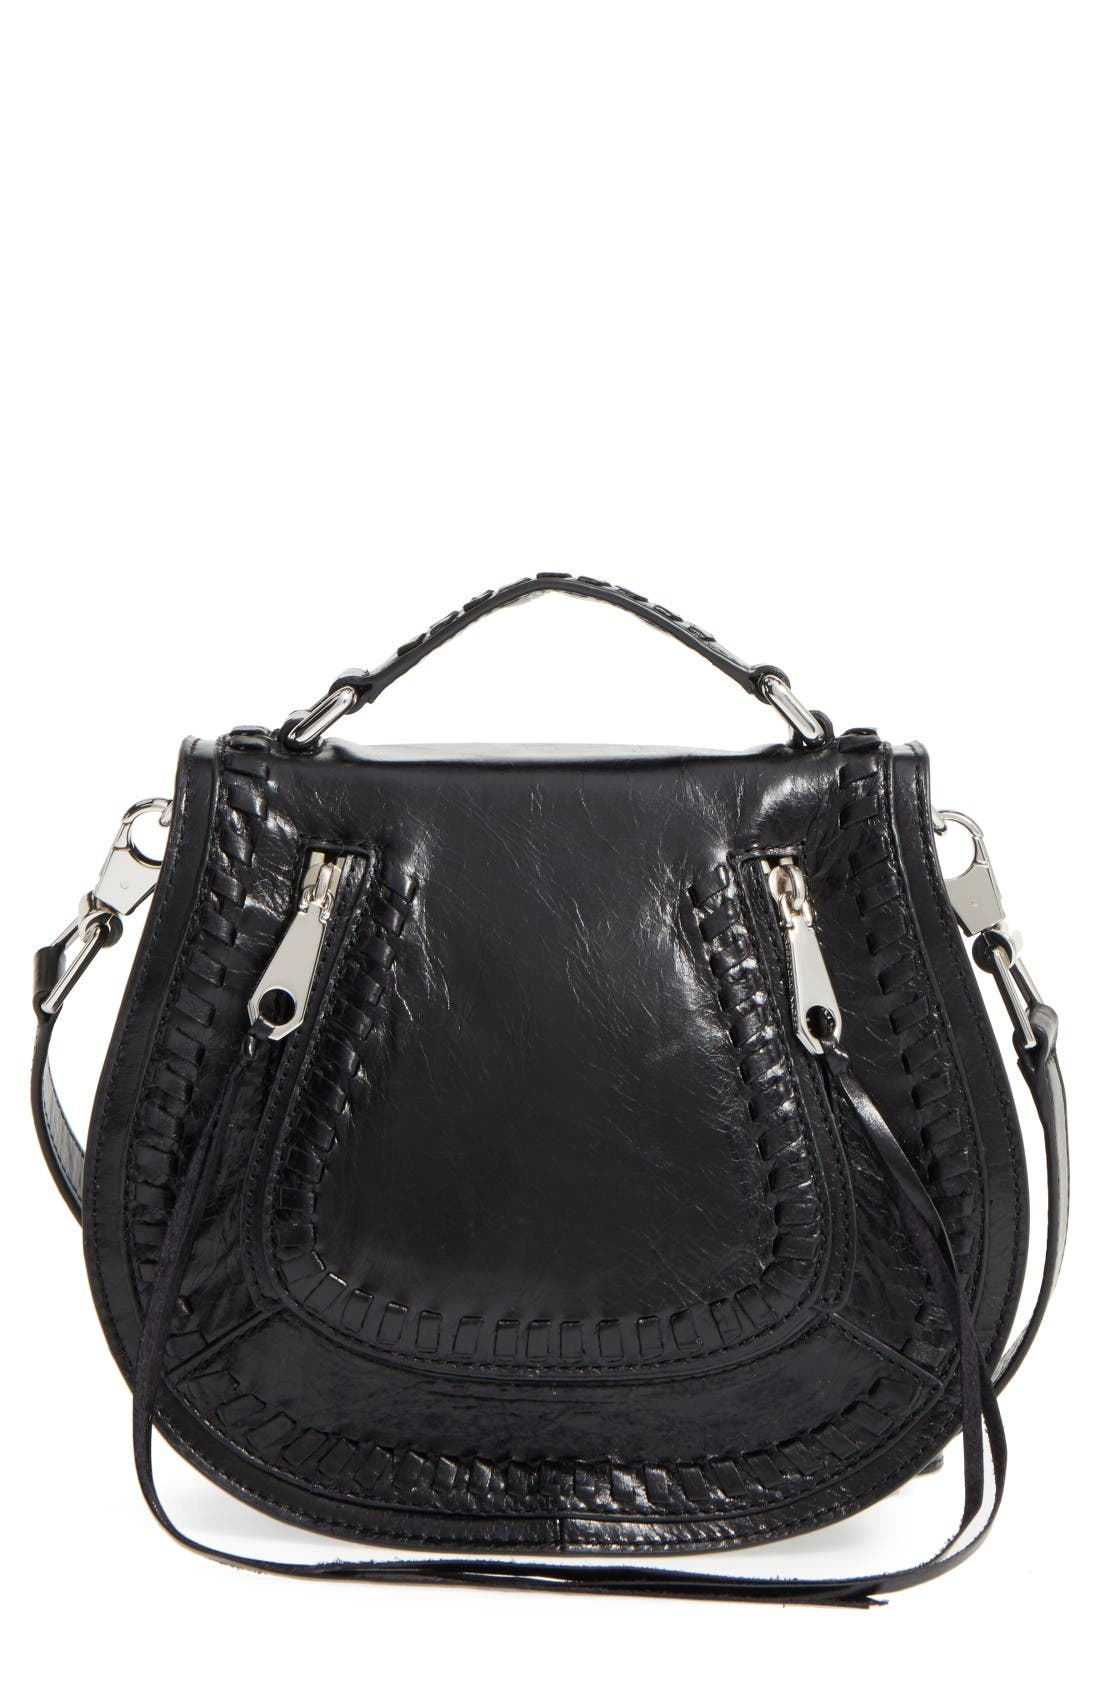 Alternate Image 1 Selected - Rebecca Minkoff Small Vanity Leather Saddle Bag